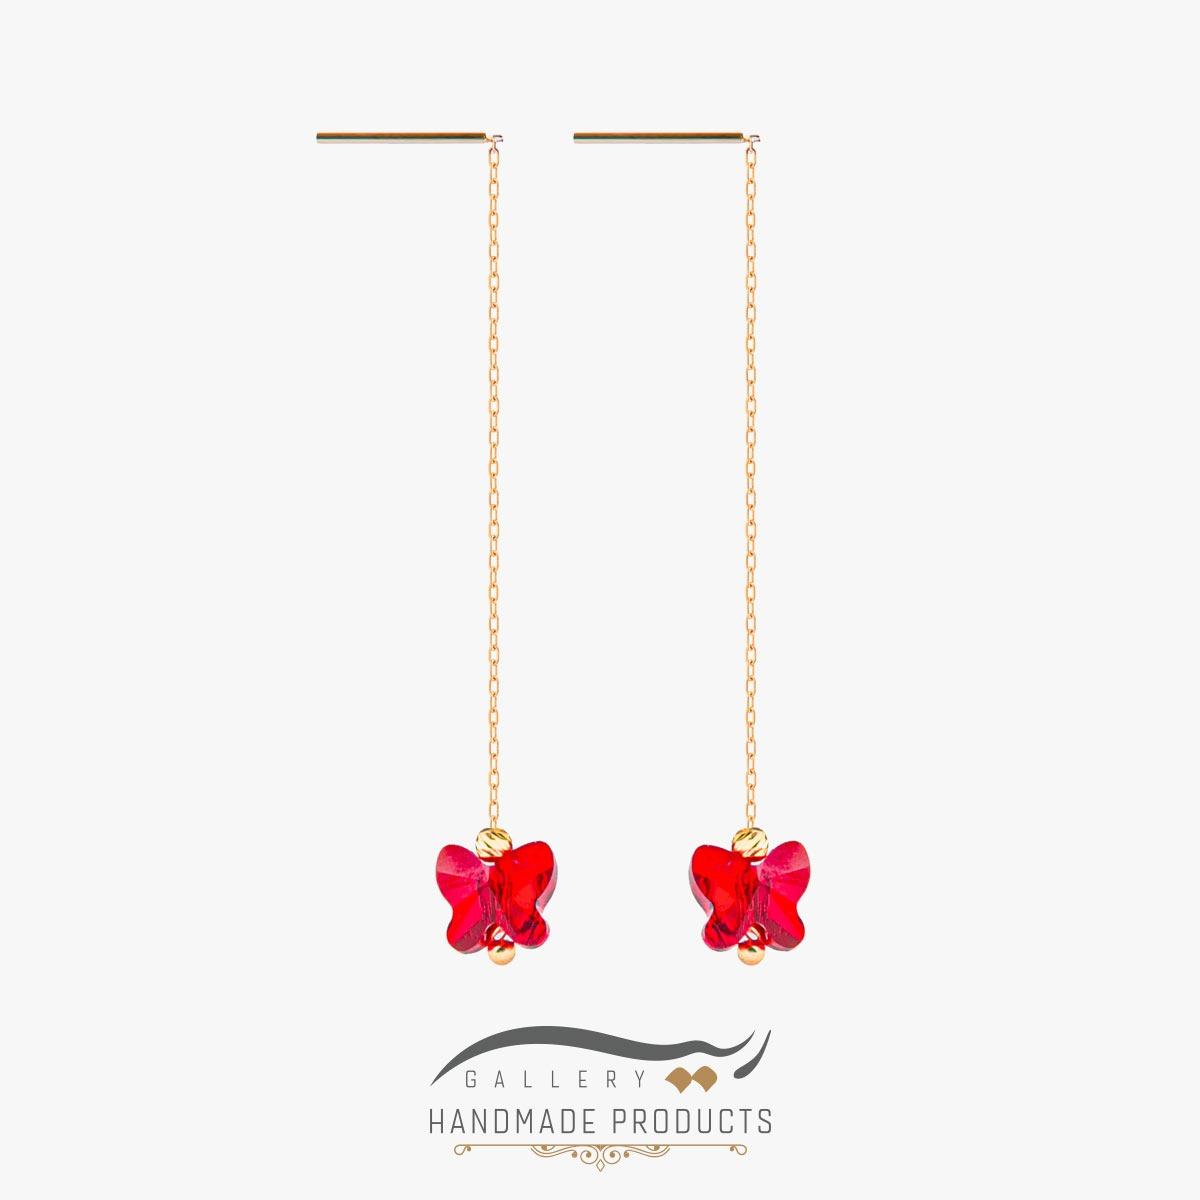 گوشواره طلا زنانه پروانه قرمز